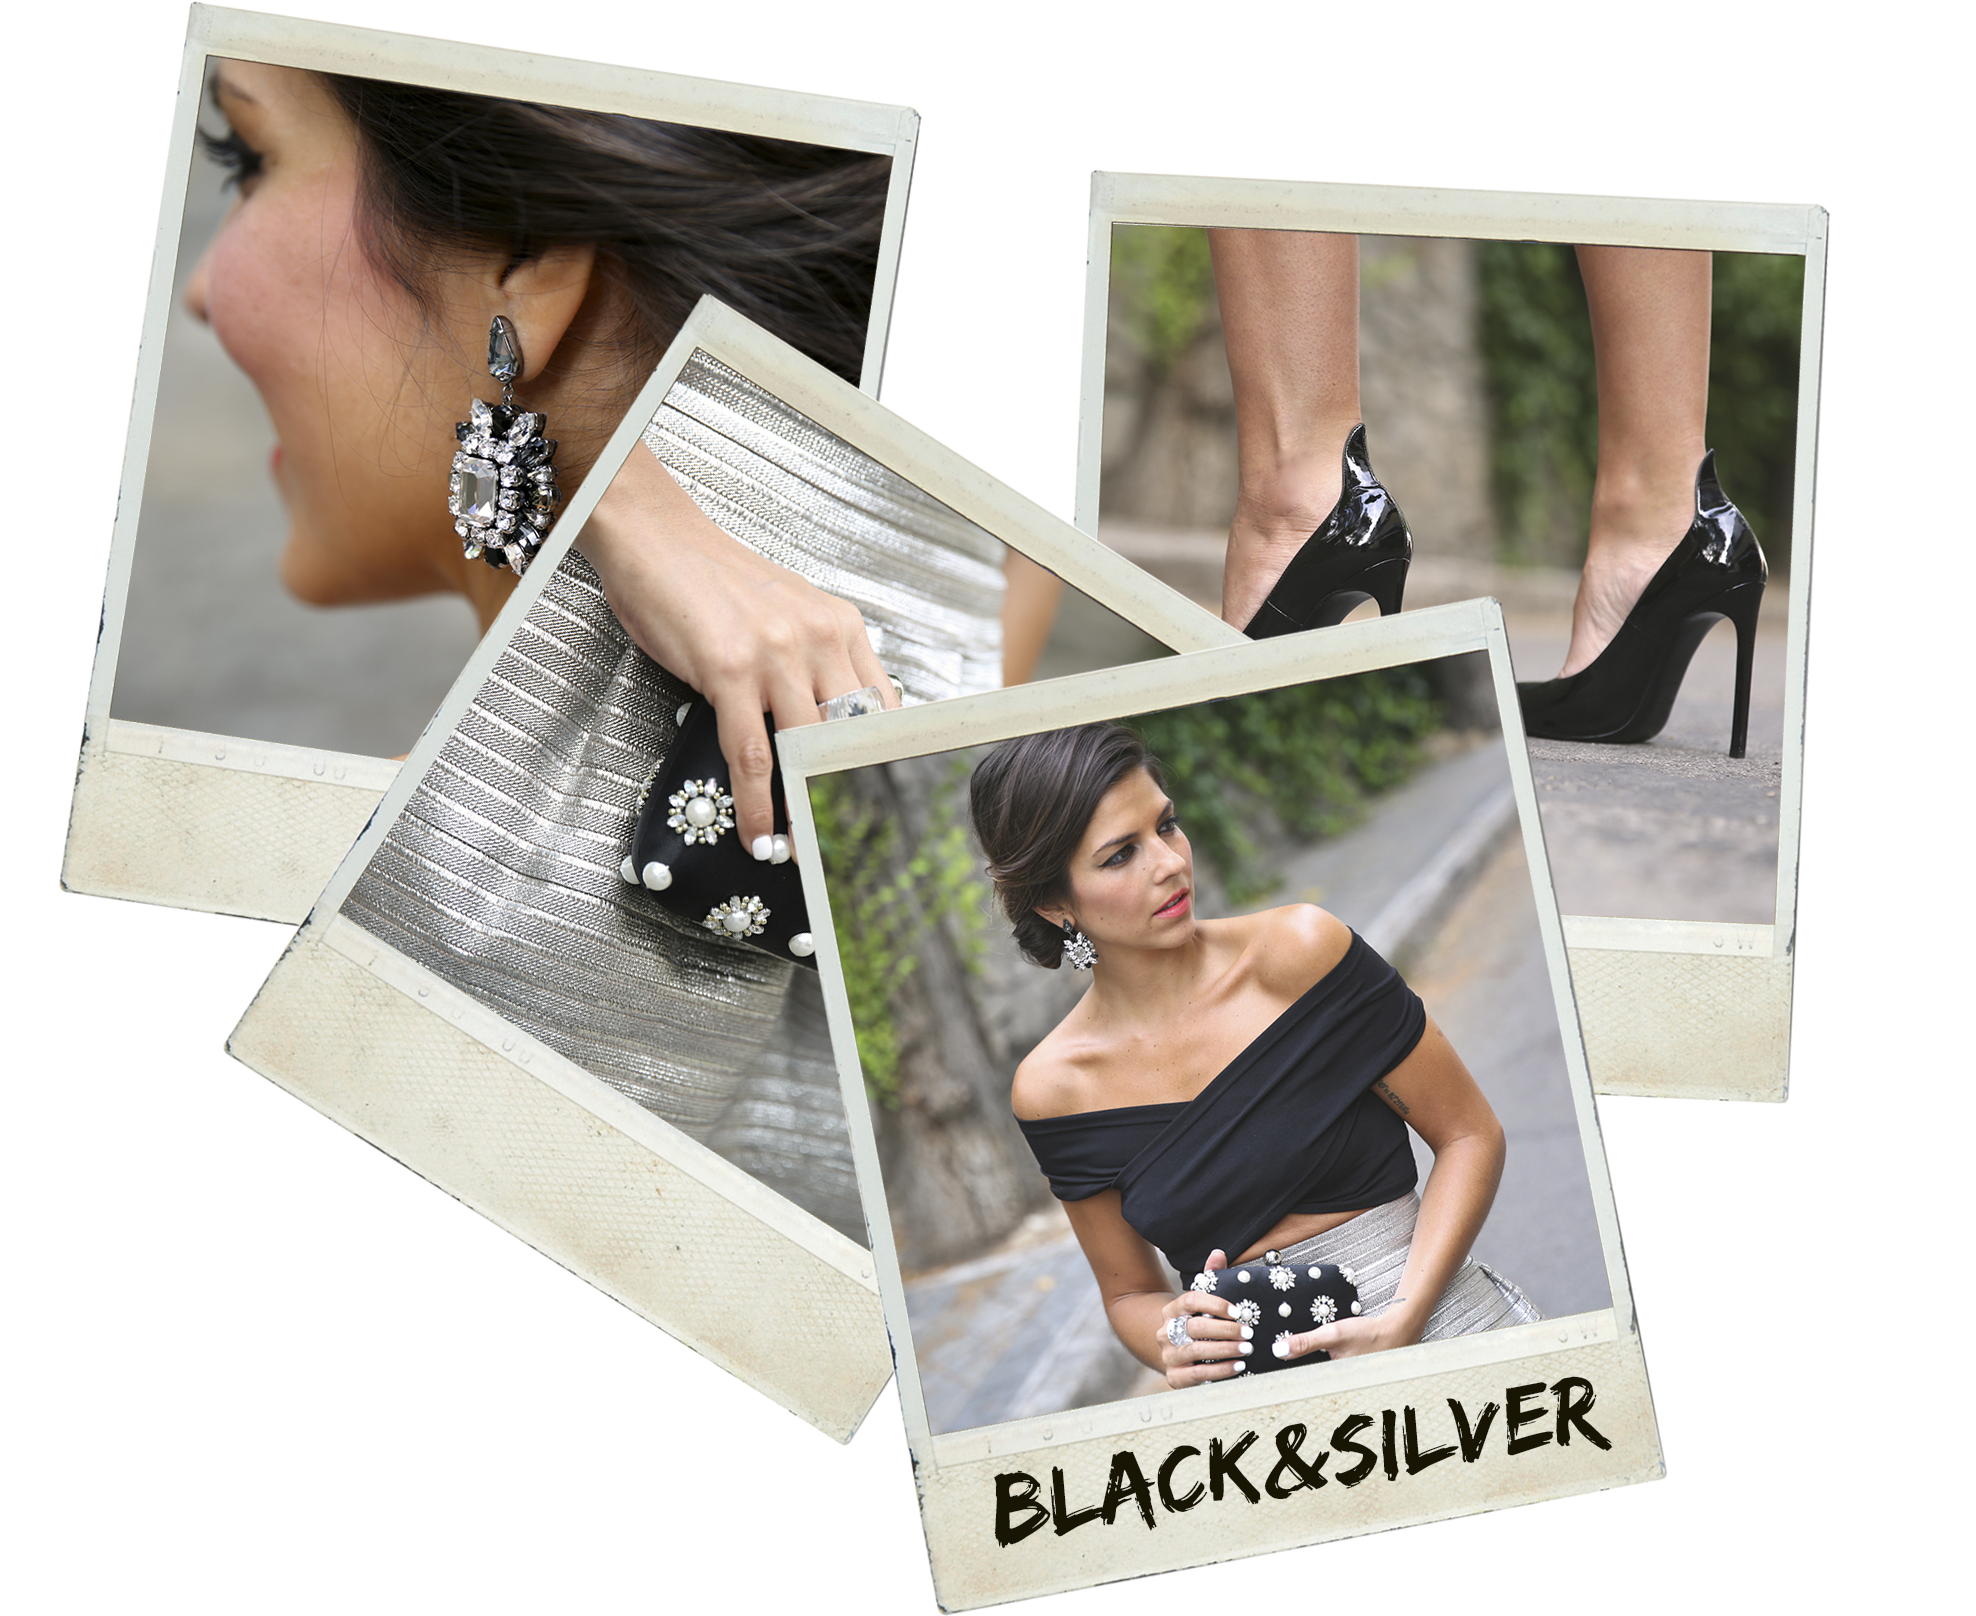 trendy_taste-look-outfit-street_style-blog-blogger-fashion_spain-moda_españa-saint_laurent-charol-crop_top-falda_plateada-silver_skirt-swarovski-wedding-boda-ocasiones_especiales-polaroid